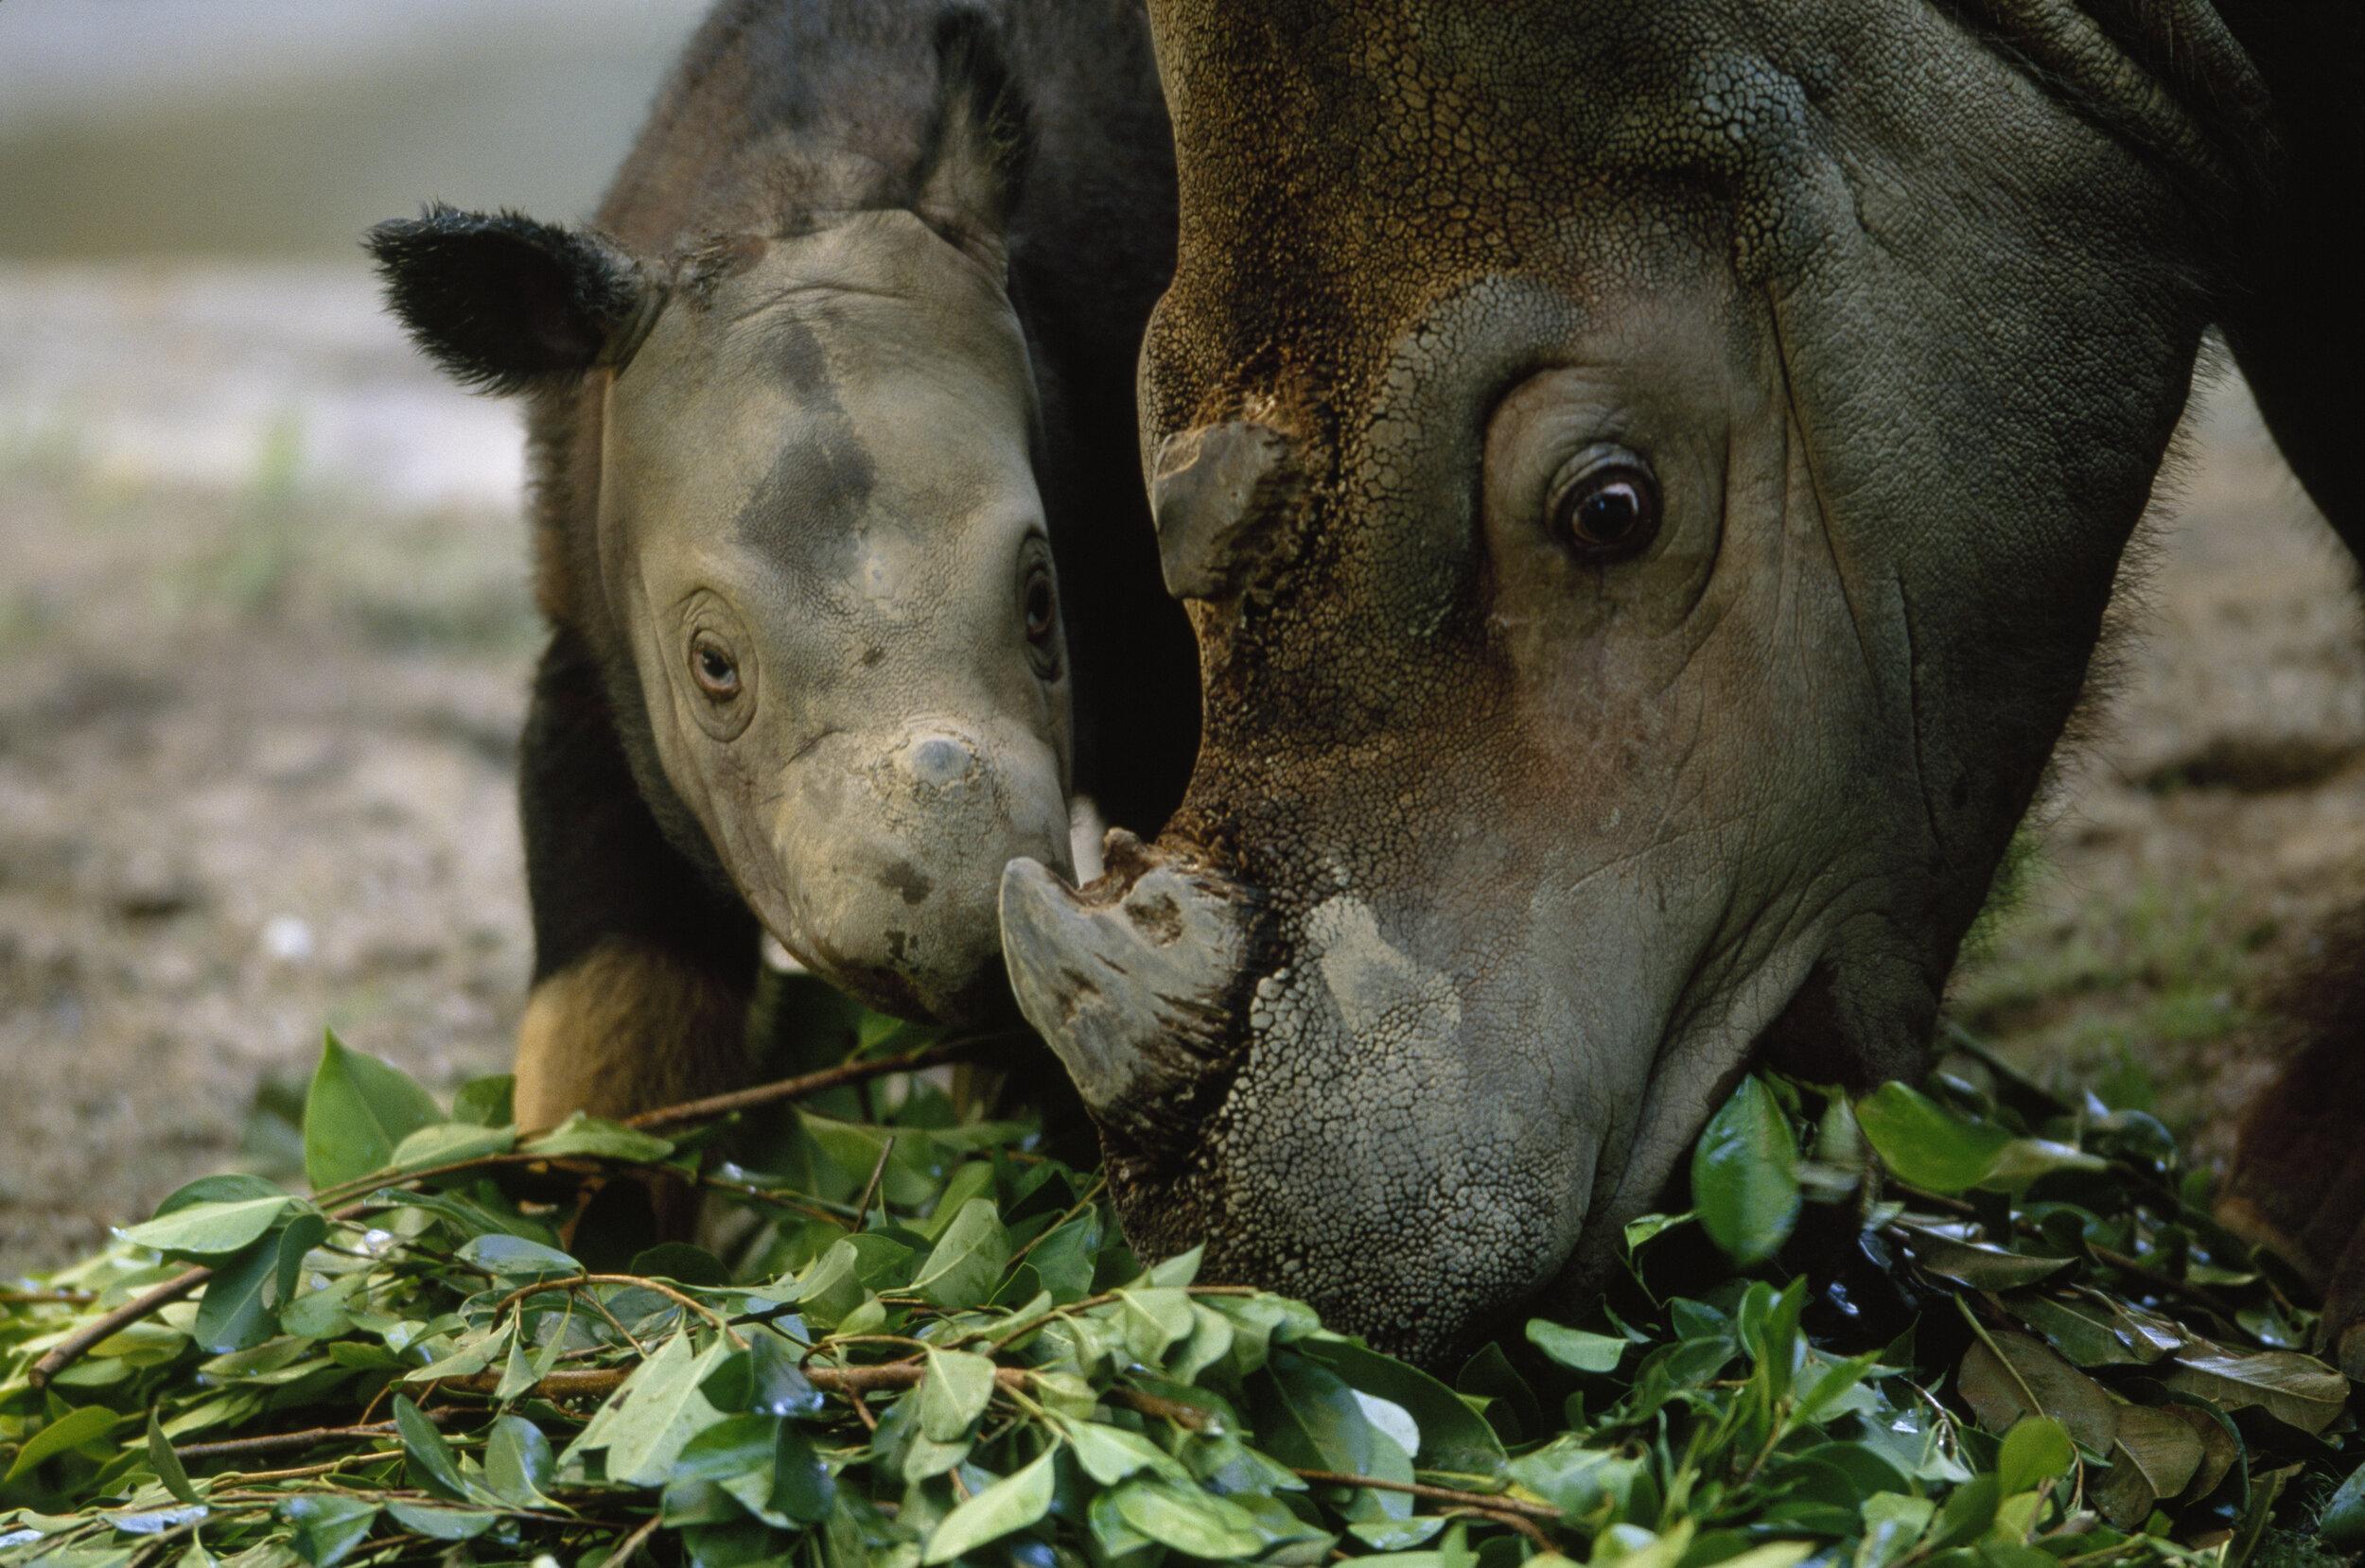 An adult Sumatran rhino and calf. Fewer than 80 Sumatran rhinos remain in the world. Photo credit: Joel Sartore/National Geographic